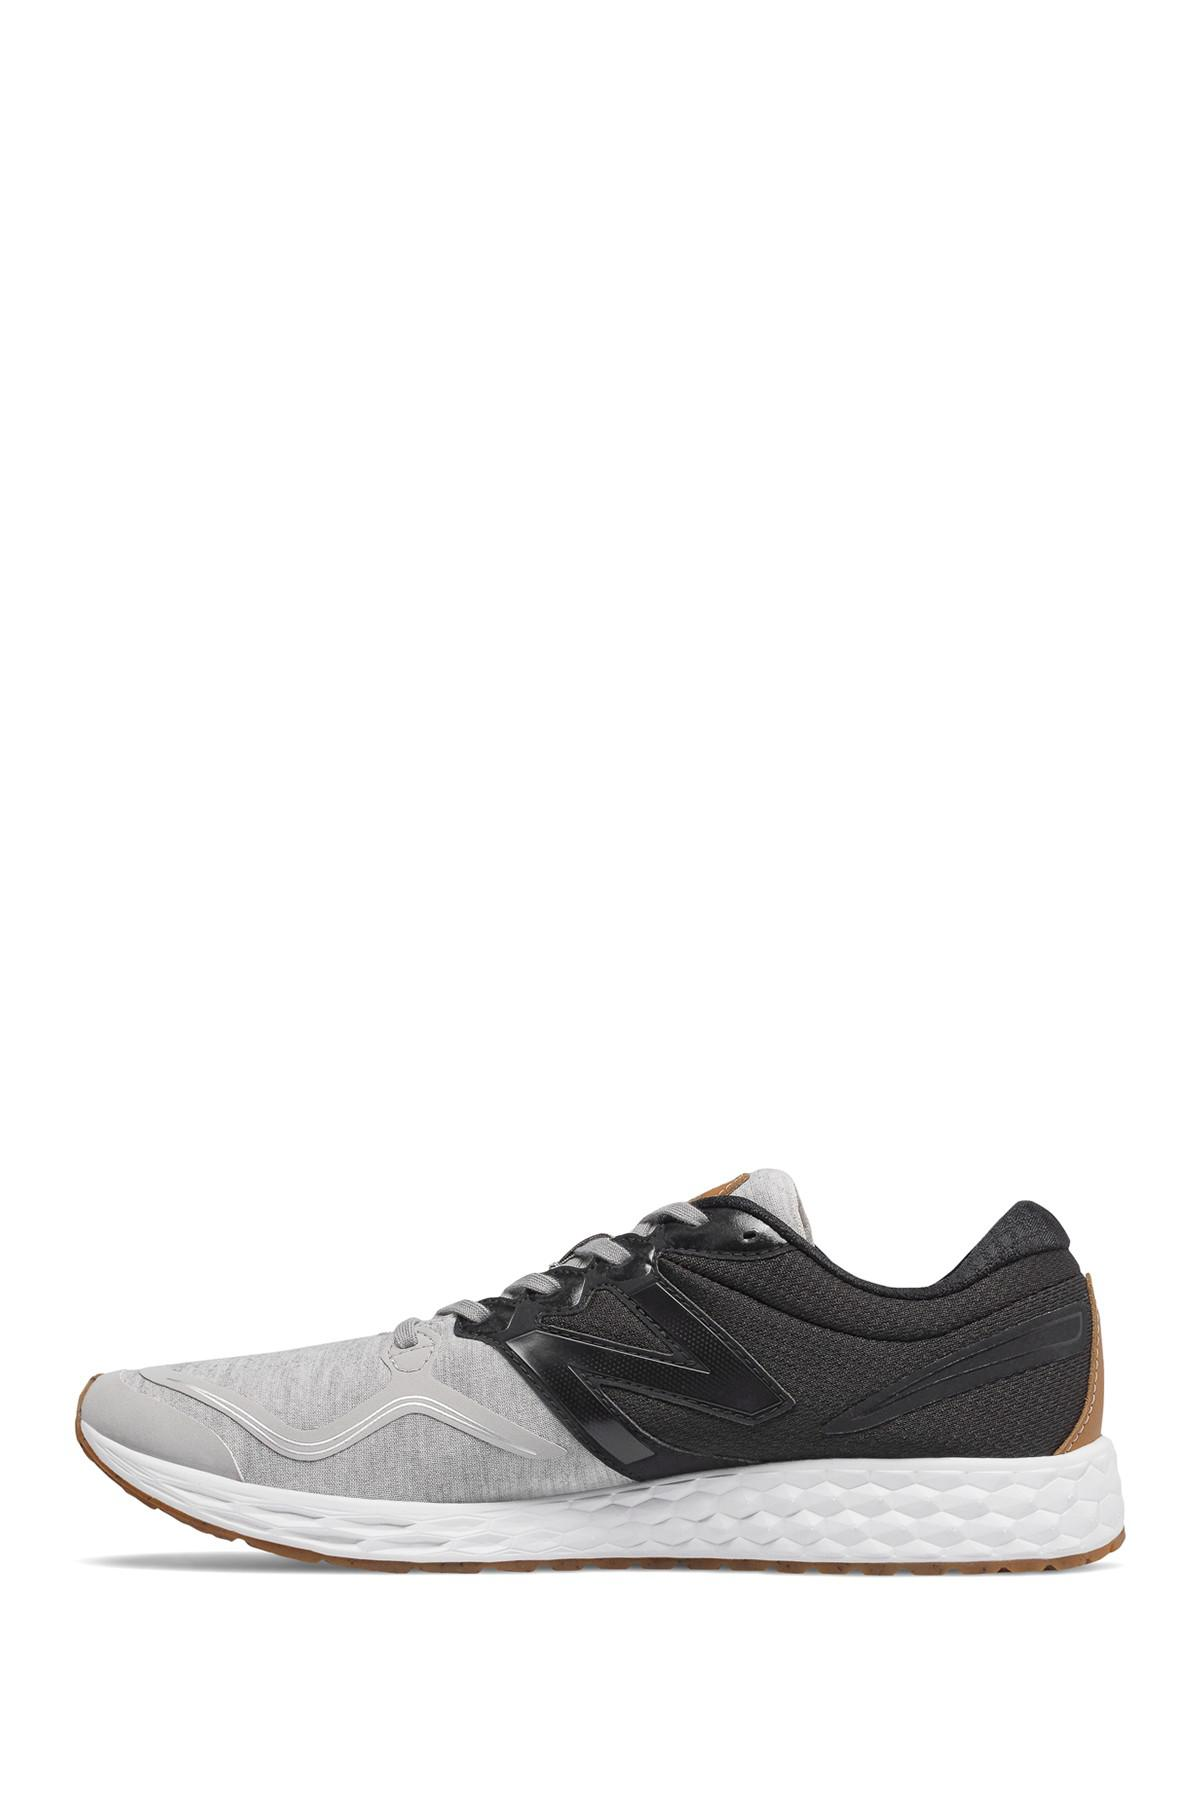 New Balance Mvnzcb1 Veniz Running Shoe